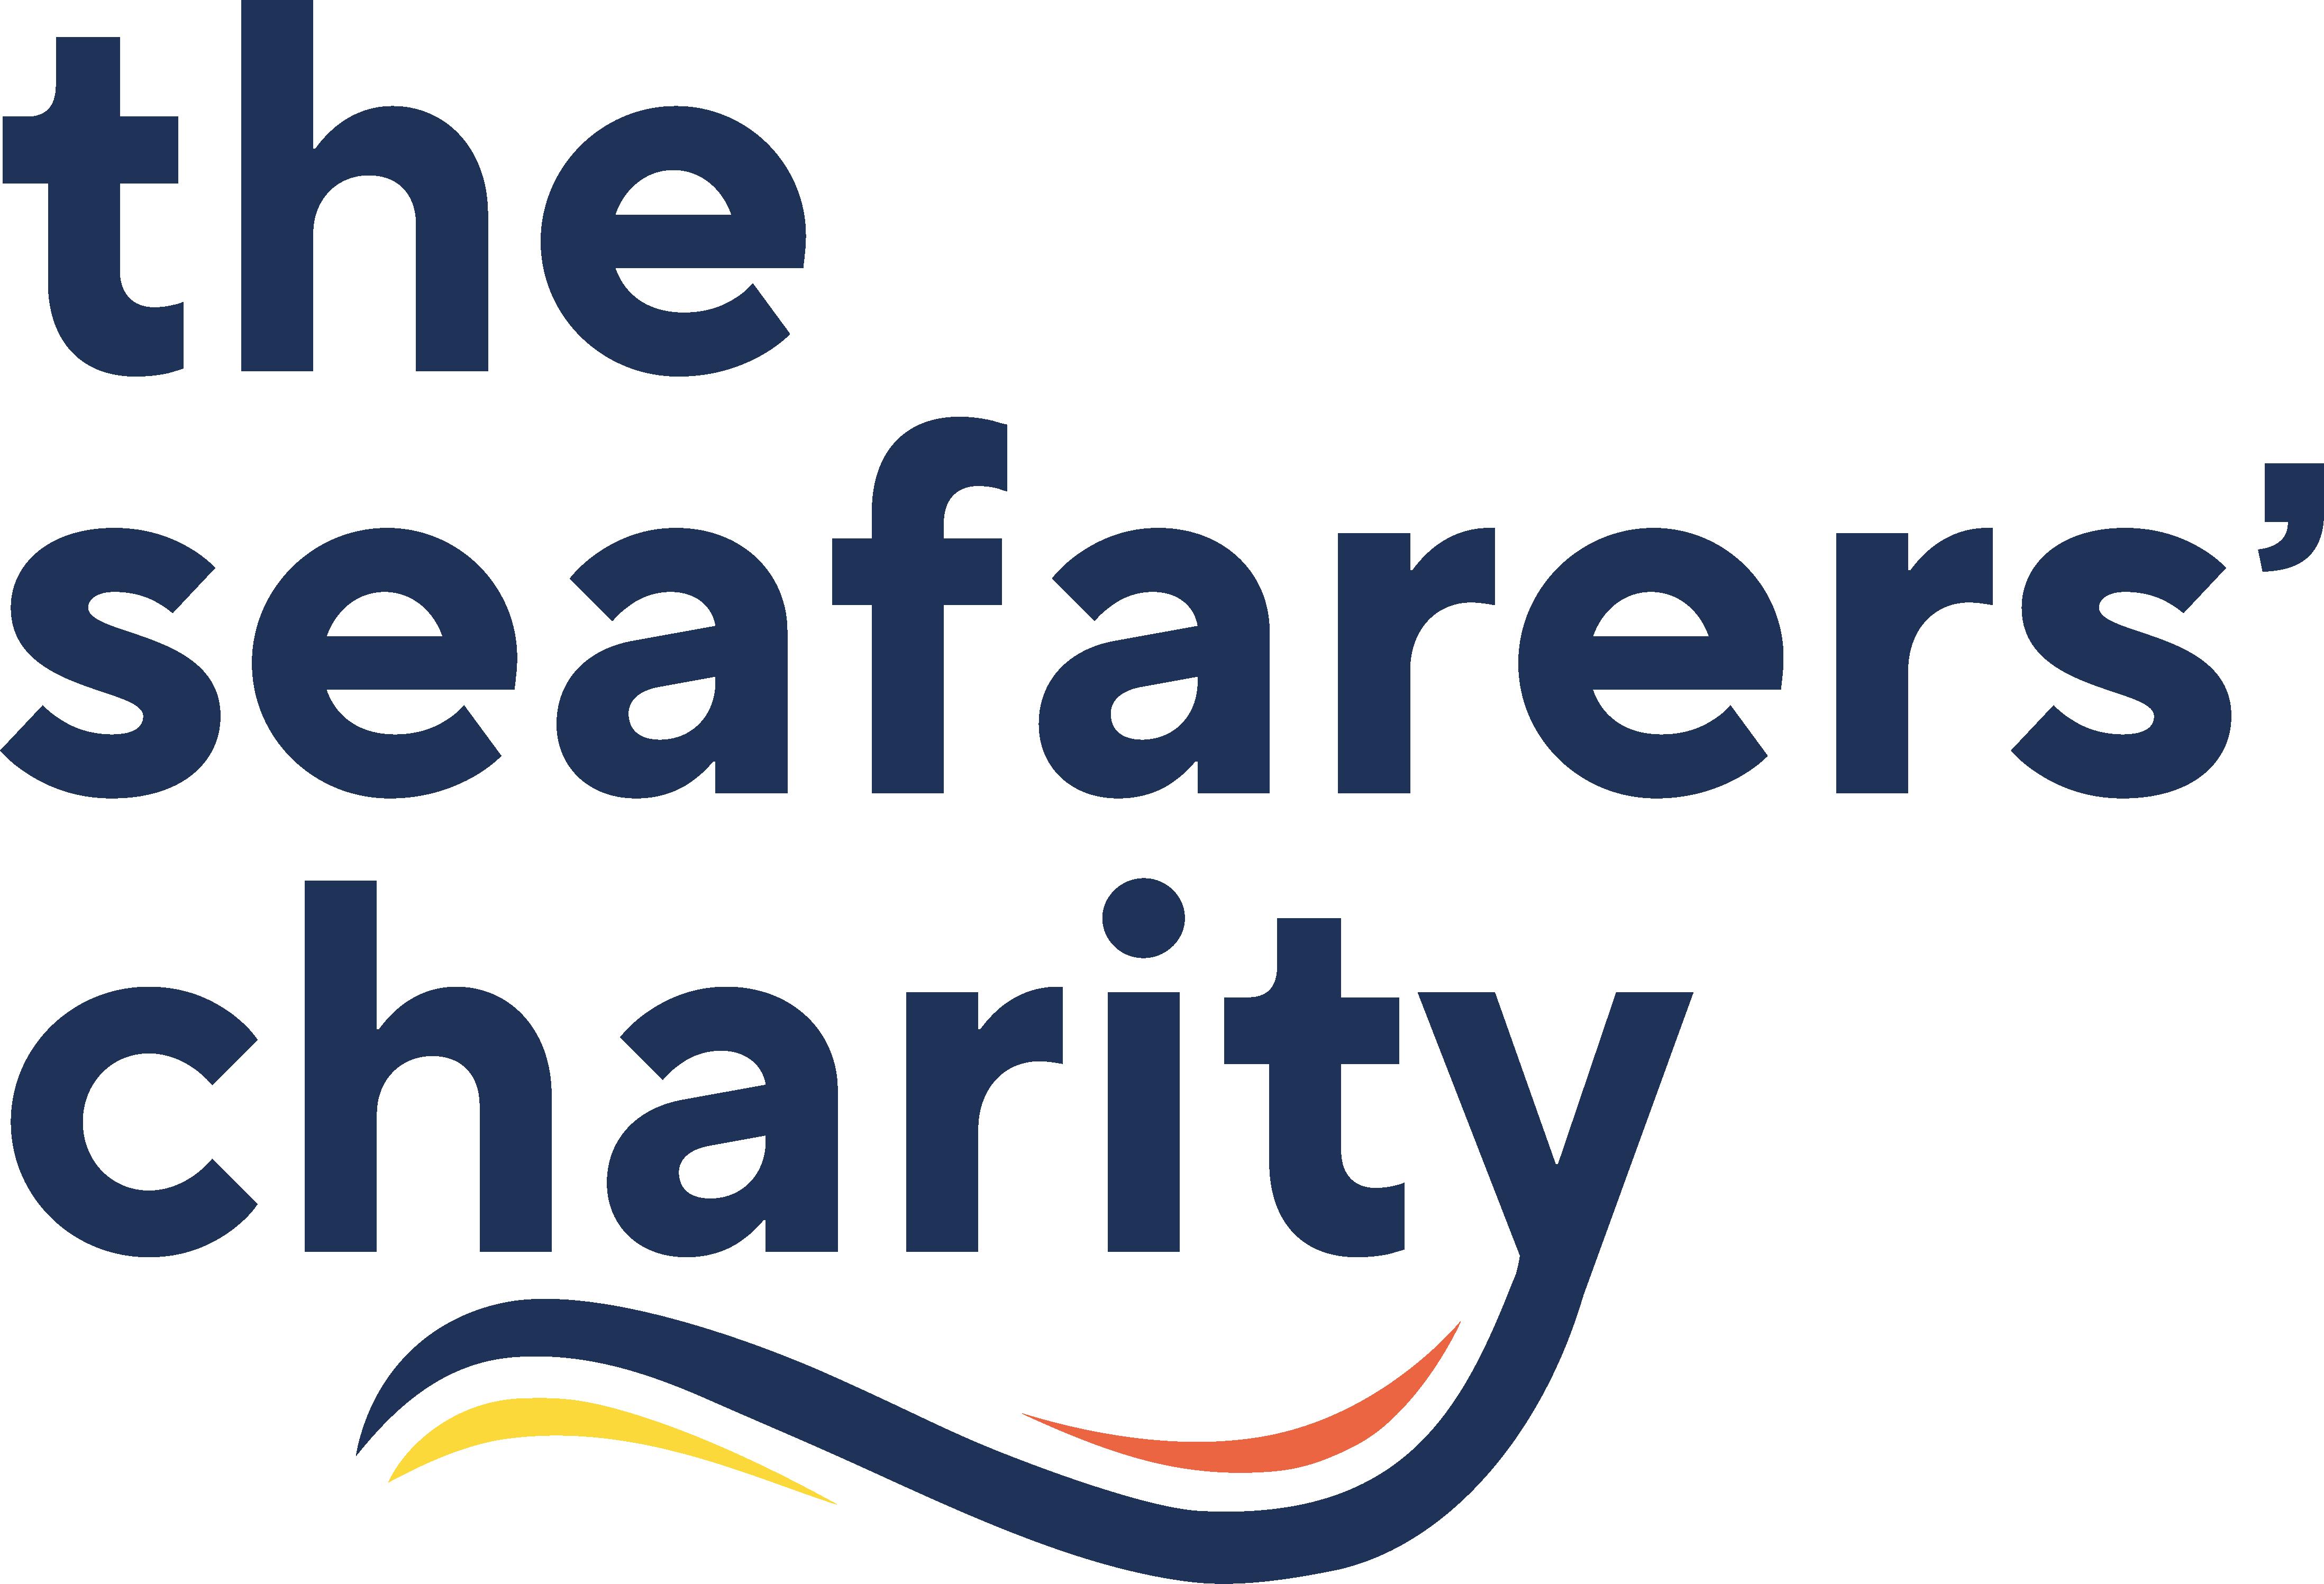 The Seafarers Charity